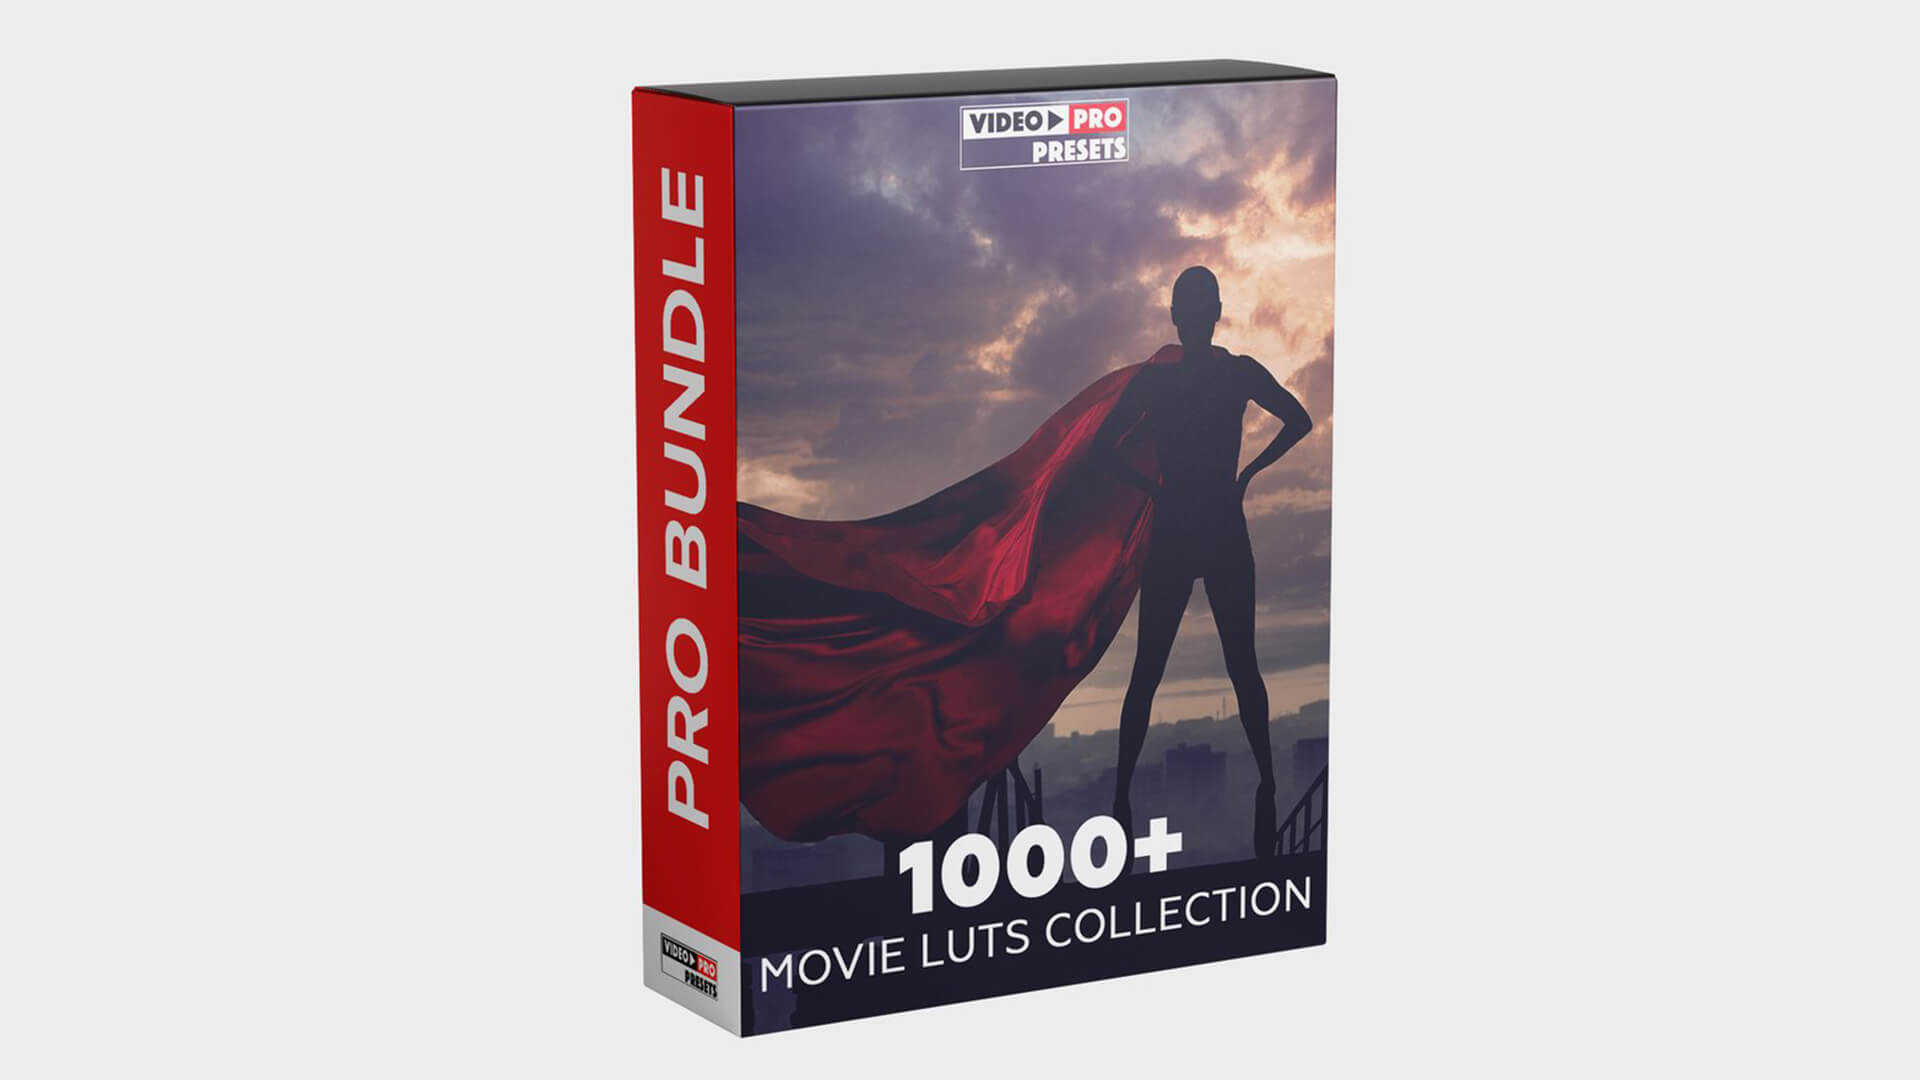 LUTs预设 1000+巨制电影调色预设 MOVIE LUTS COLLECTION 2020